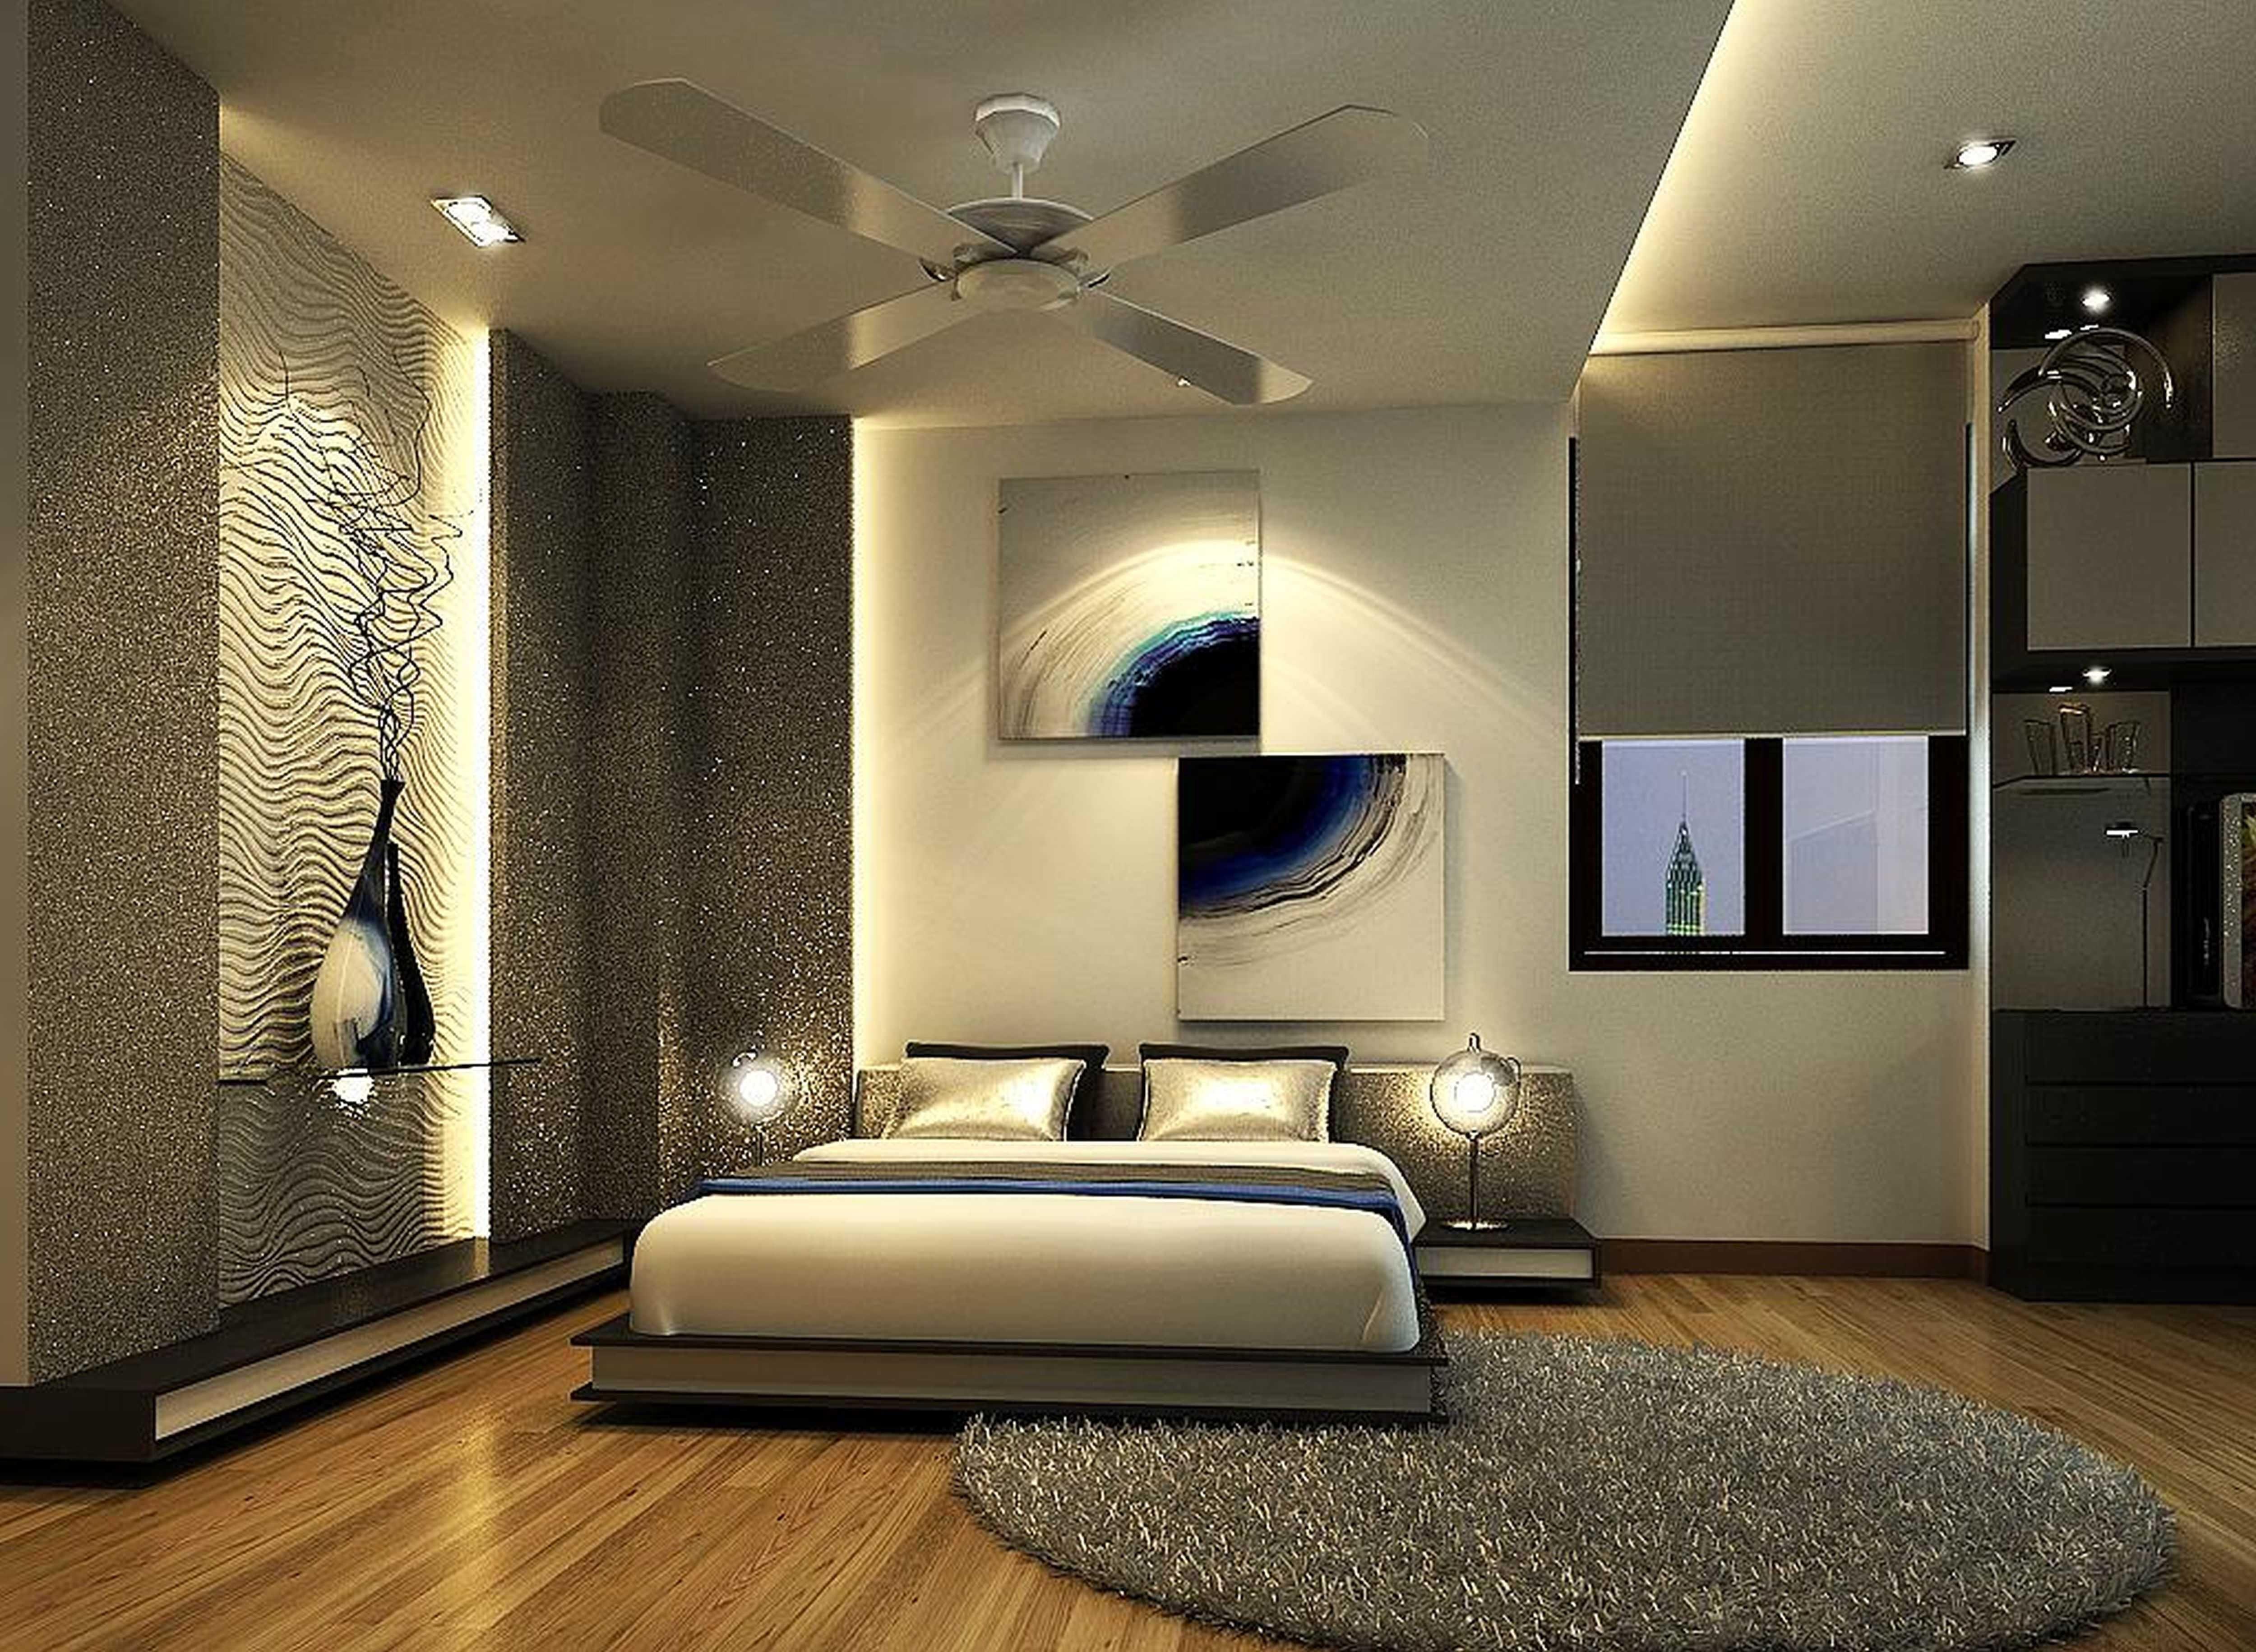 Creative Bedroom Ceiling Design 12